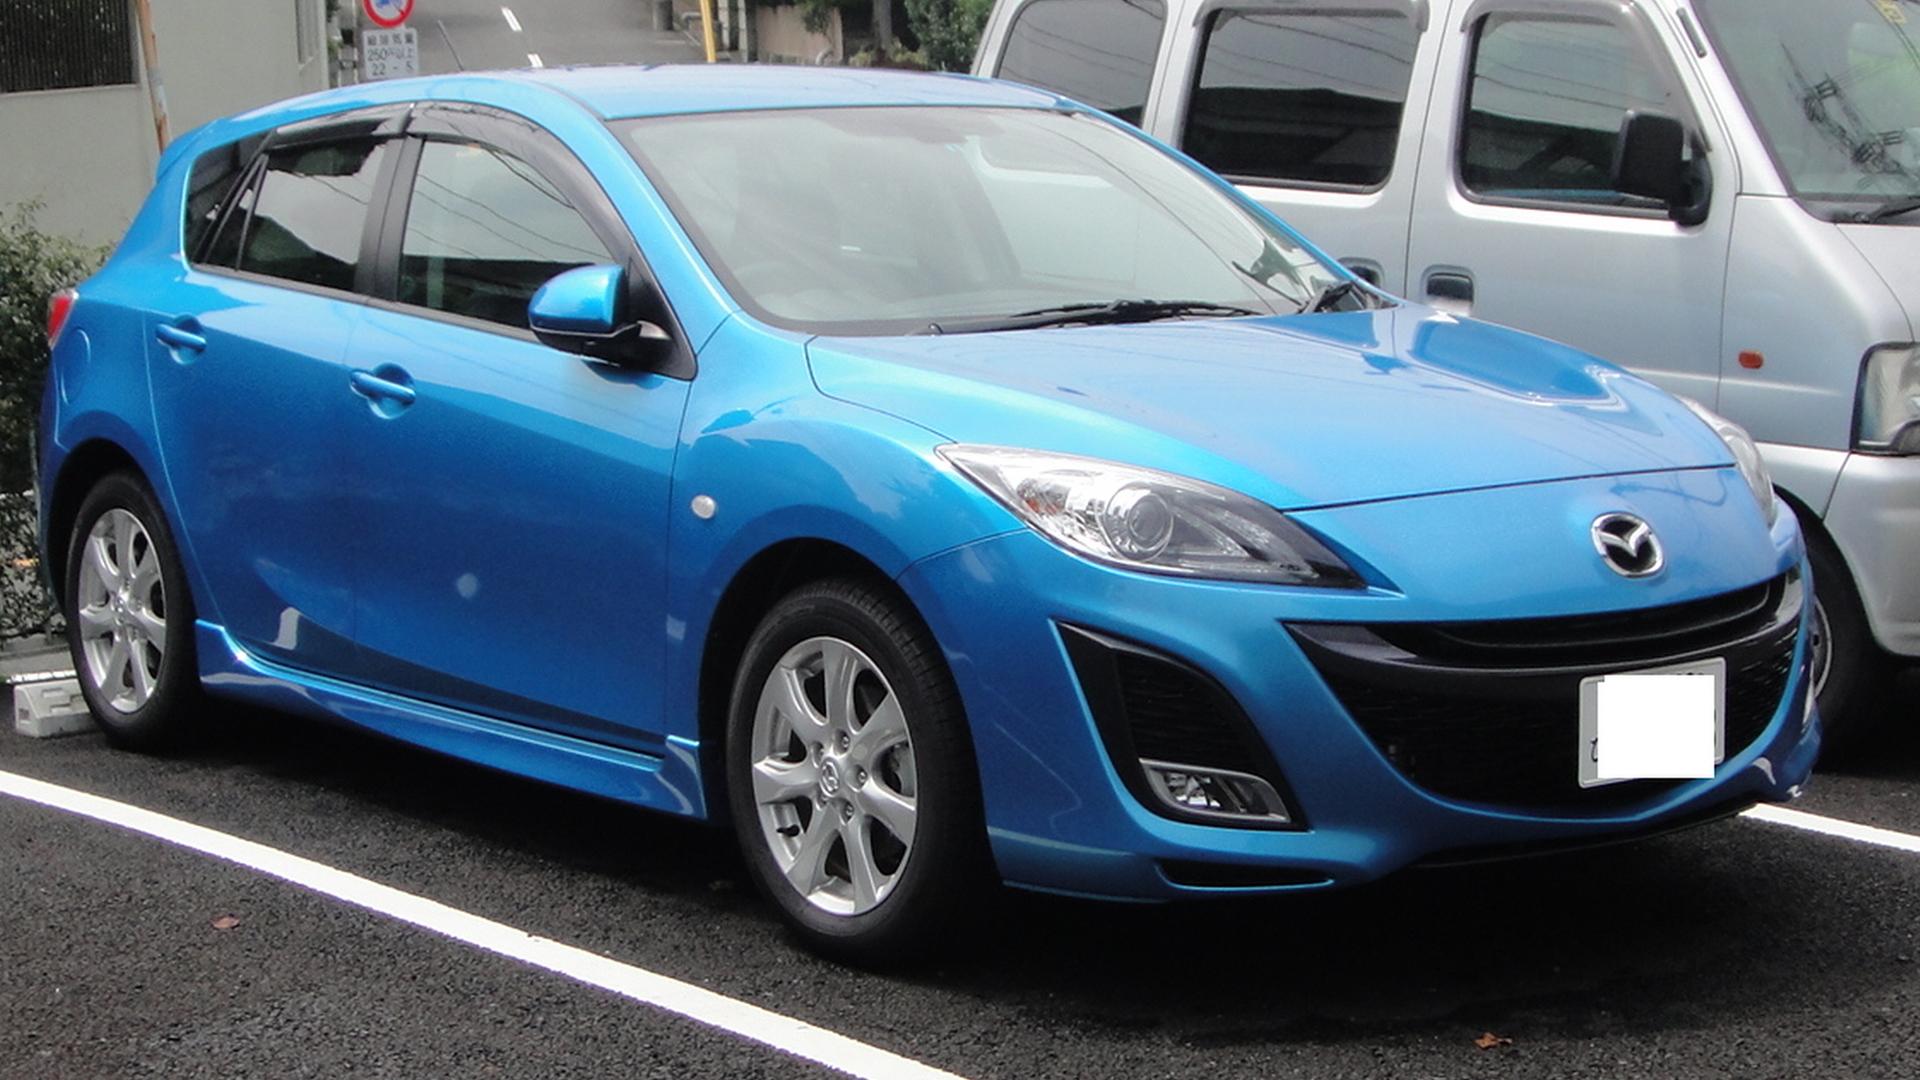 Mazda 3 Sport >> File:Mazda Axela Sport 2nd front Tx-re.jpg - Wikimedia Commons